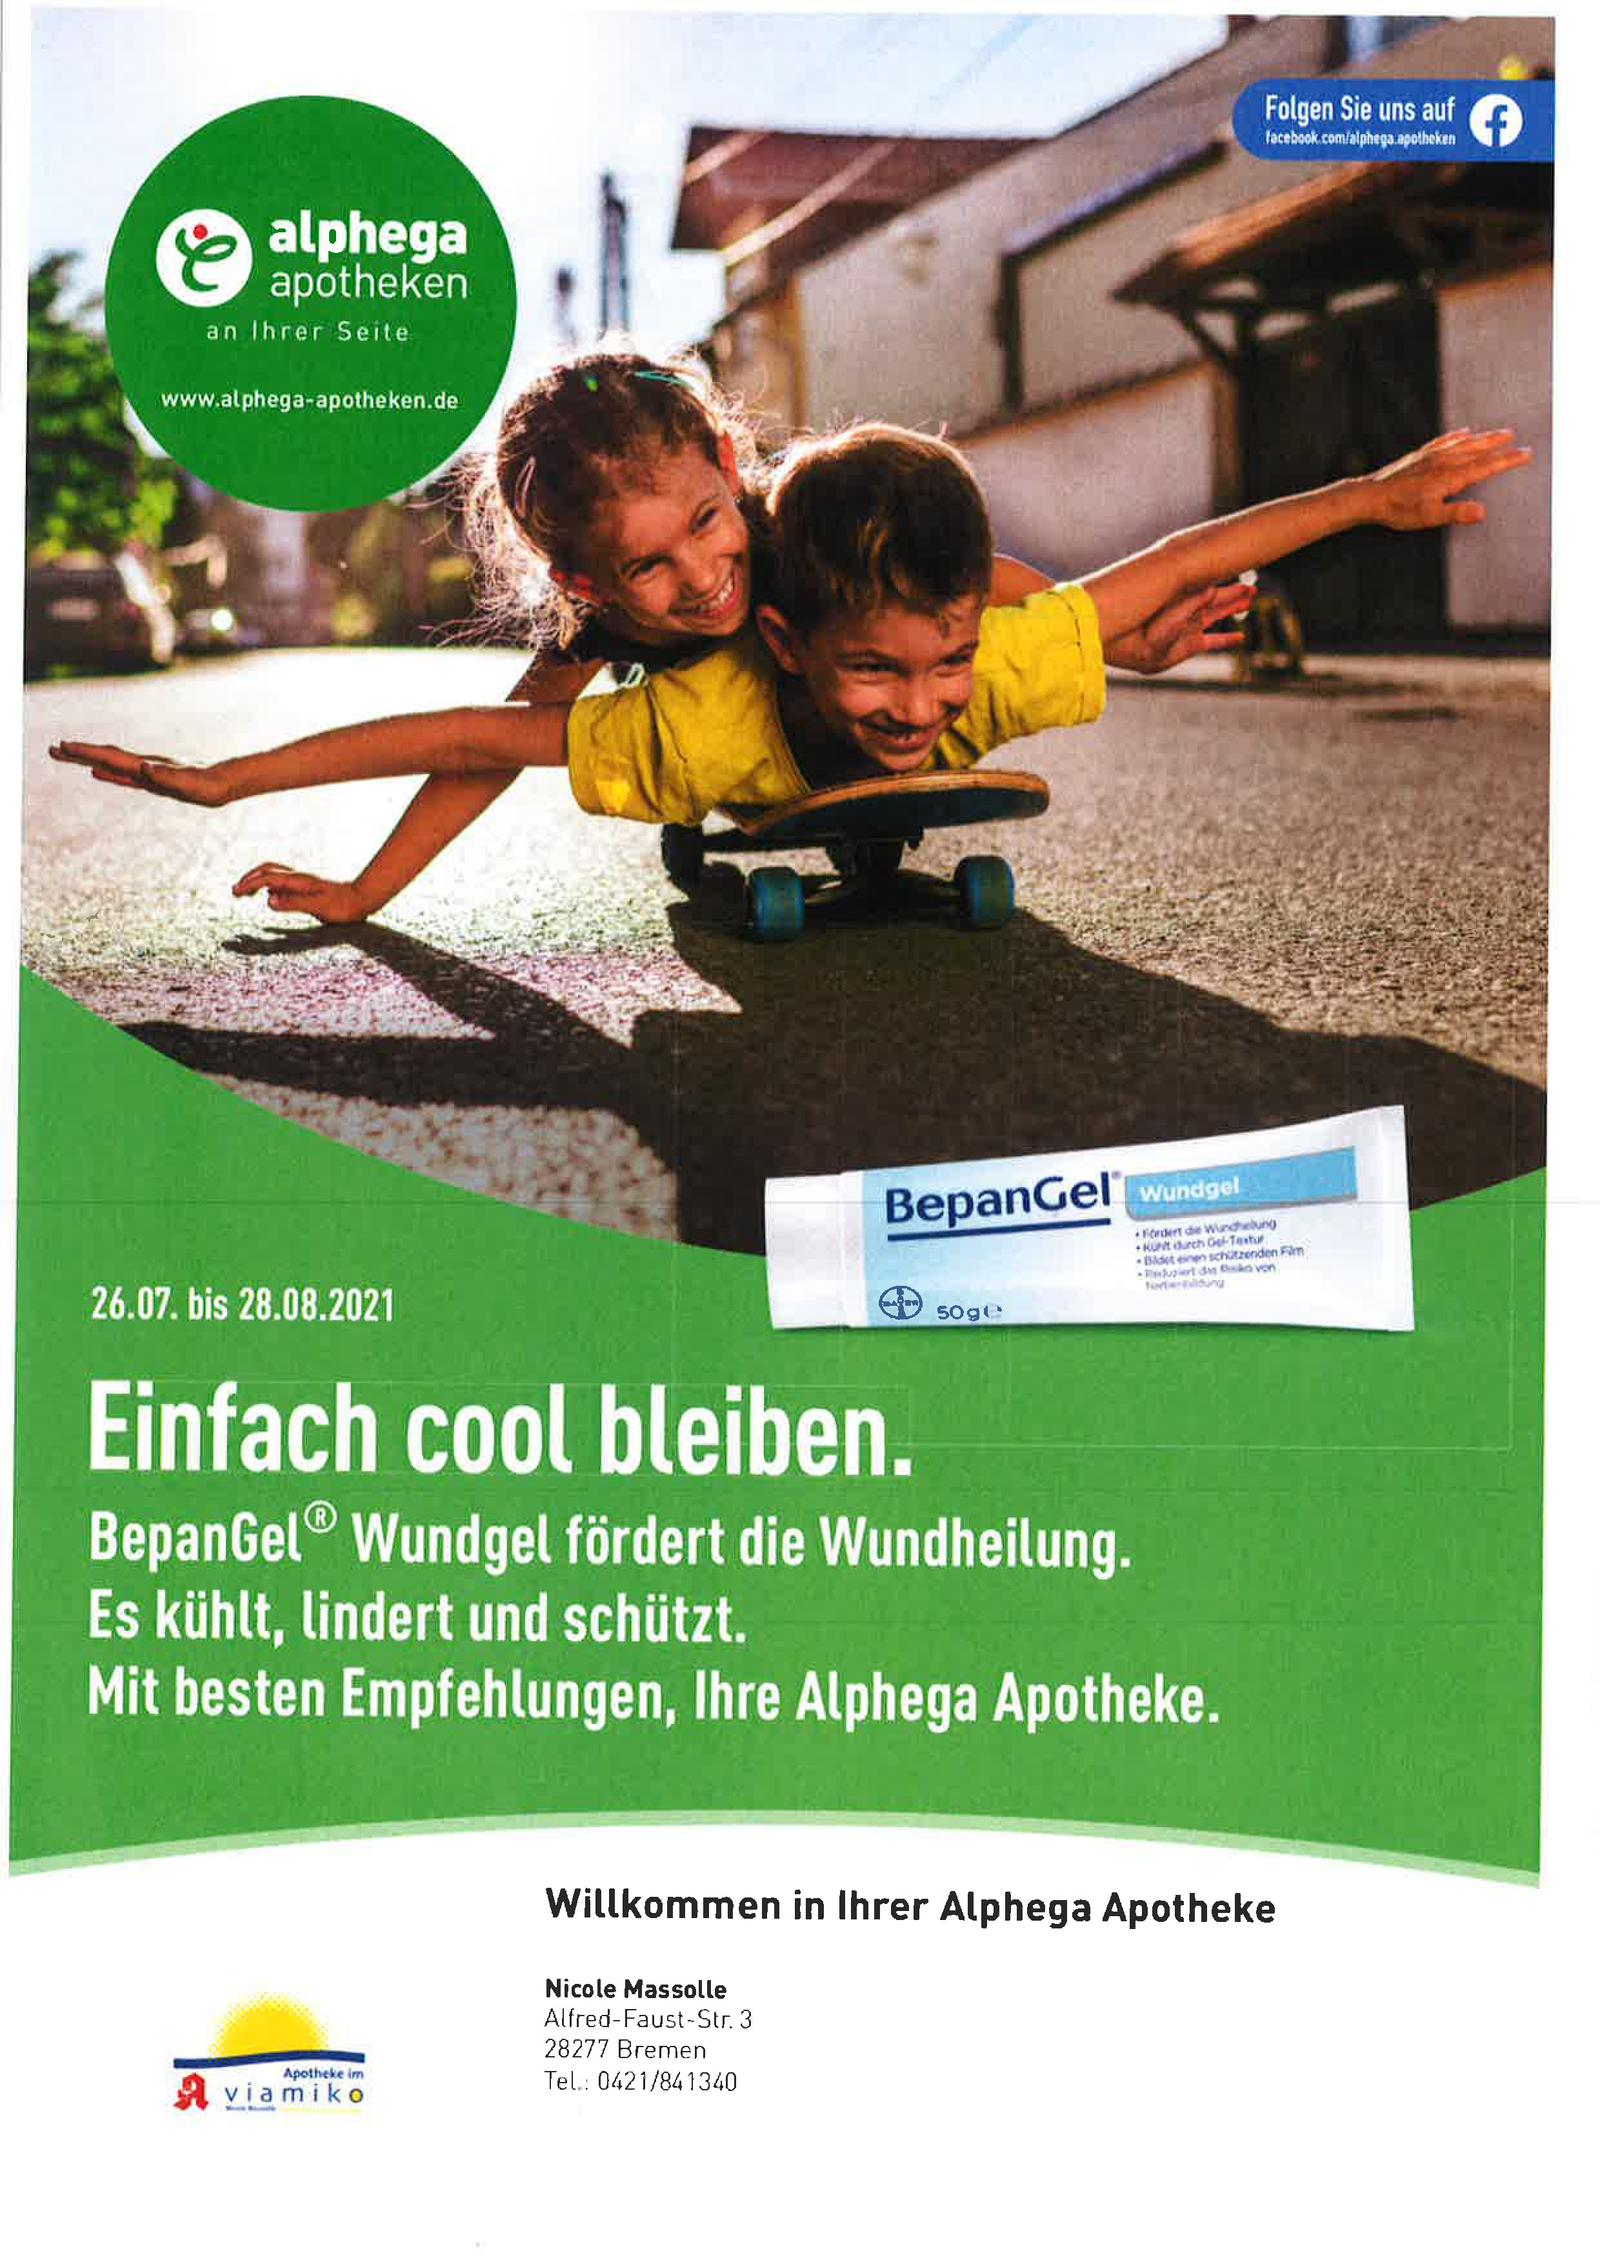 https://mein-uploads.apocdn.net/25993/leaflets/25993_flyer-Seite1.png